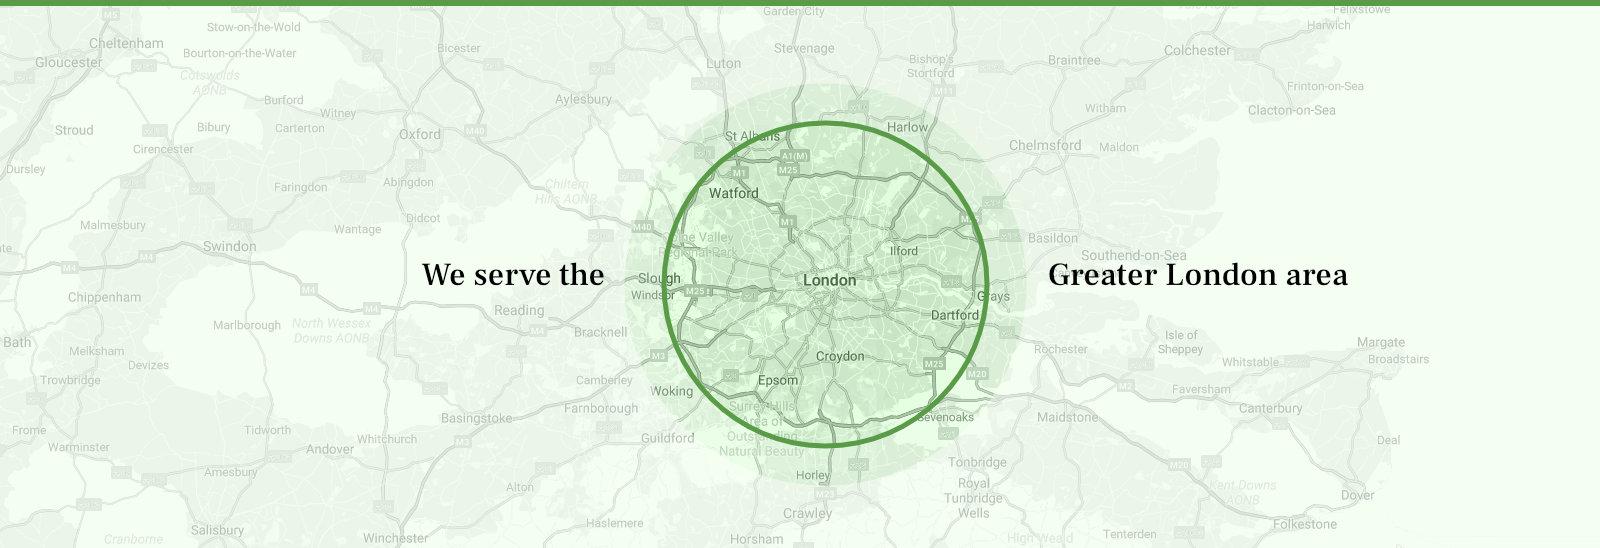 We serve the London area